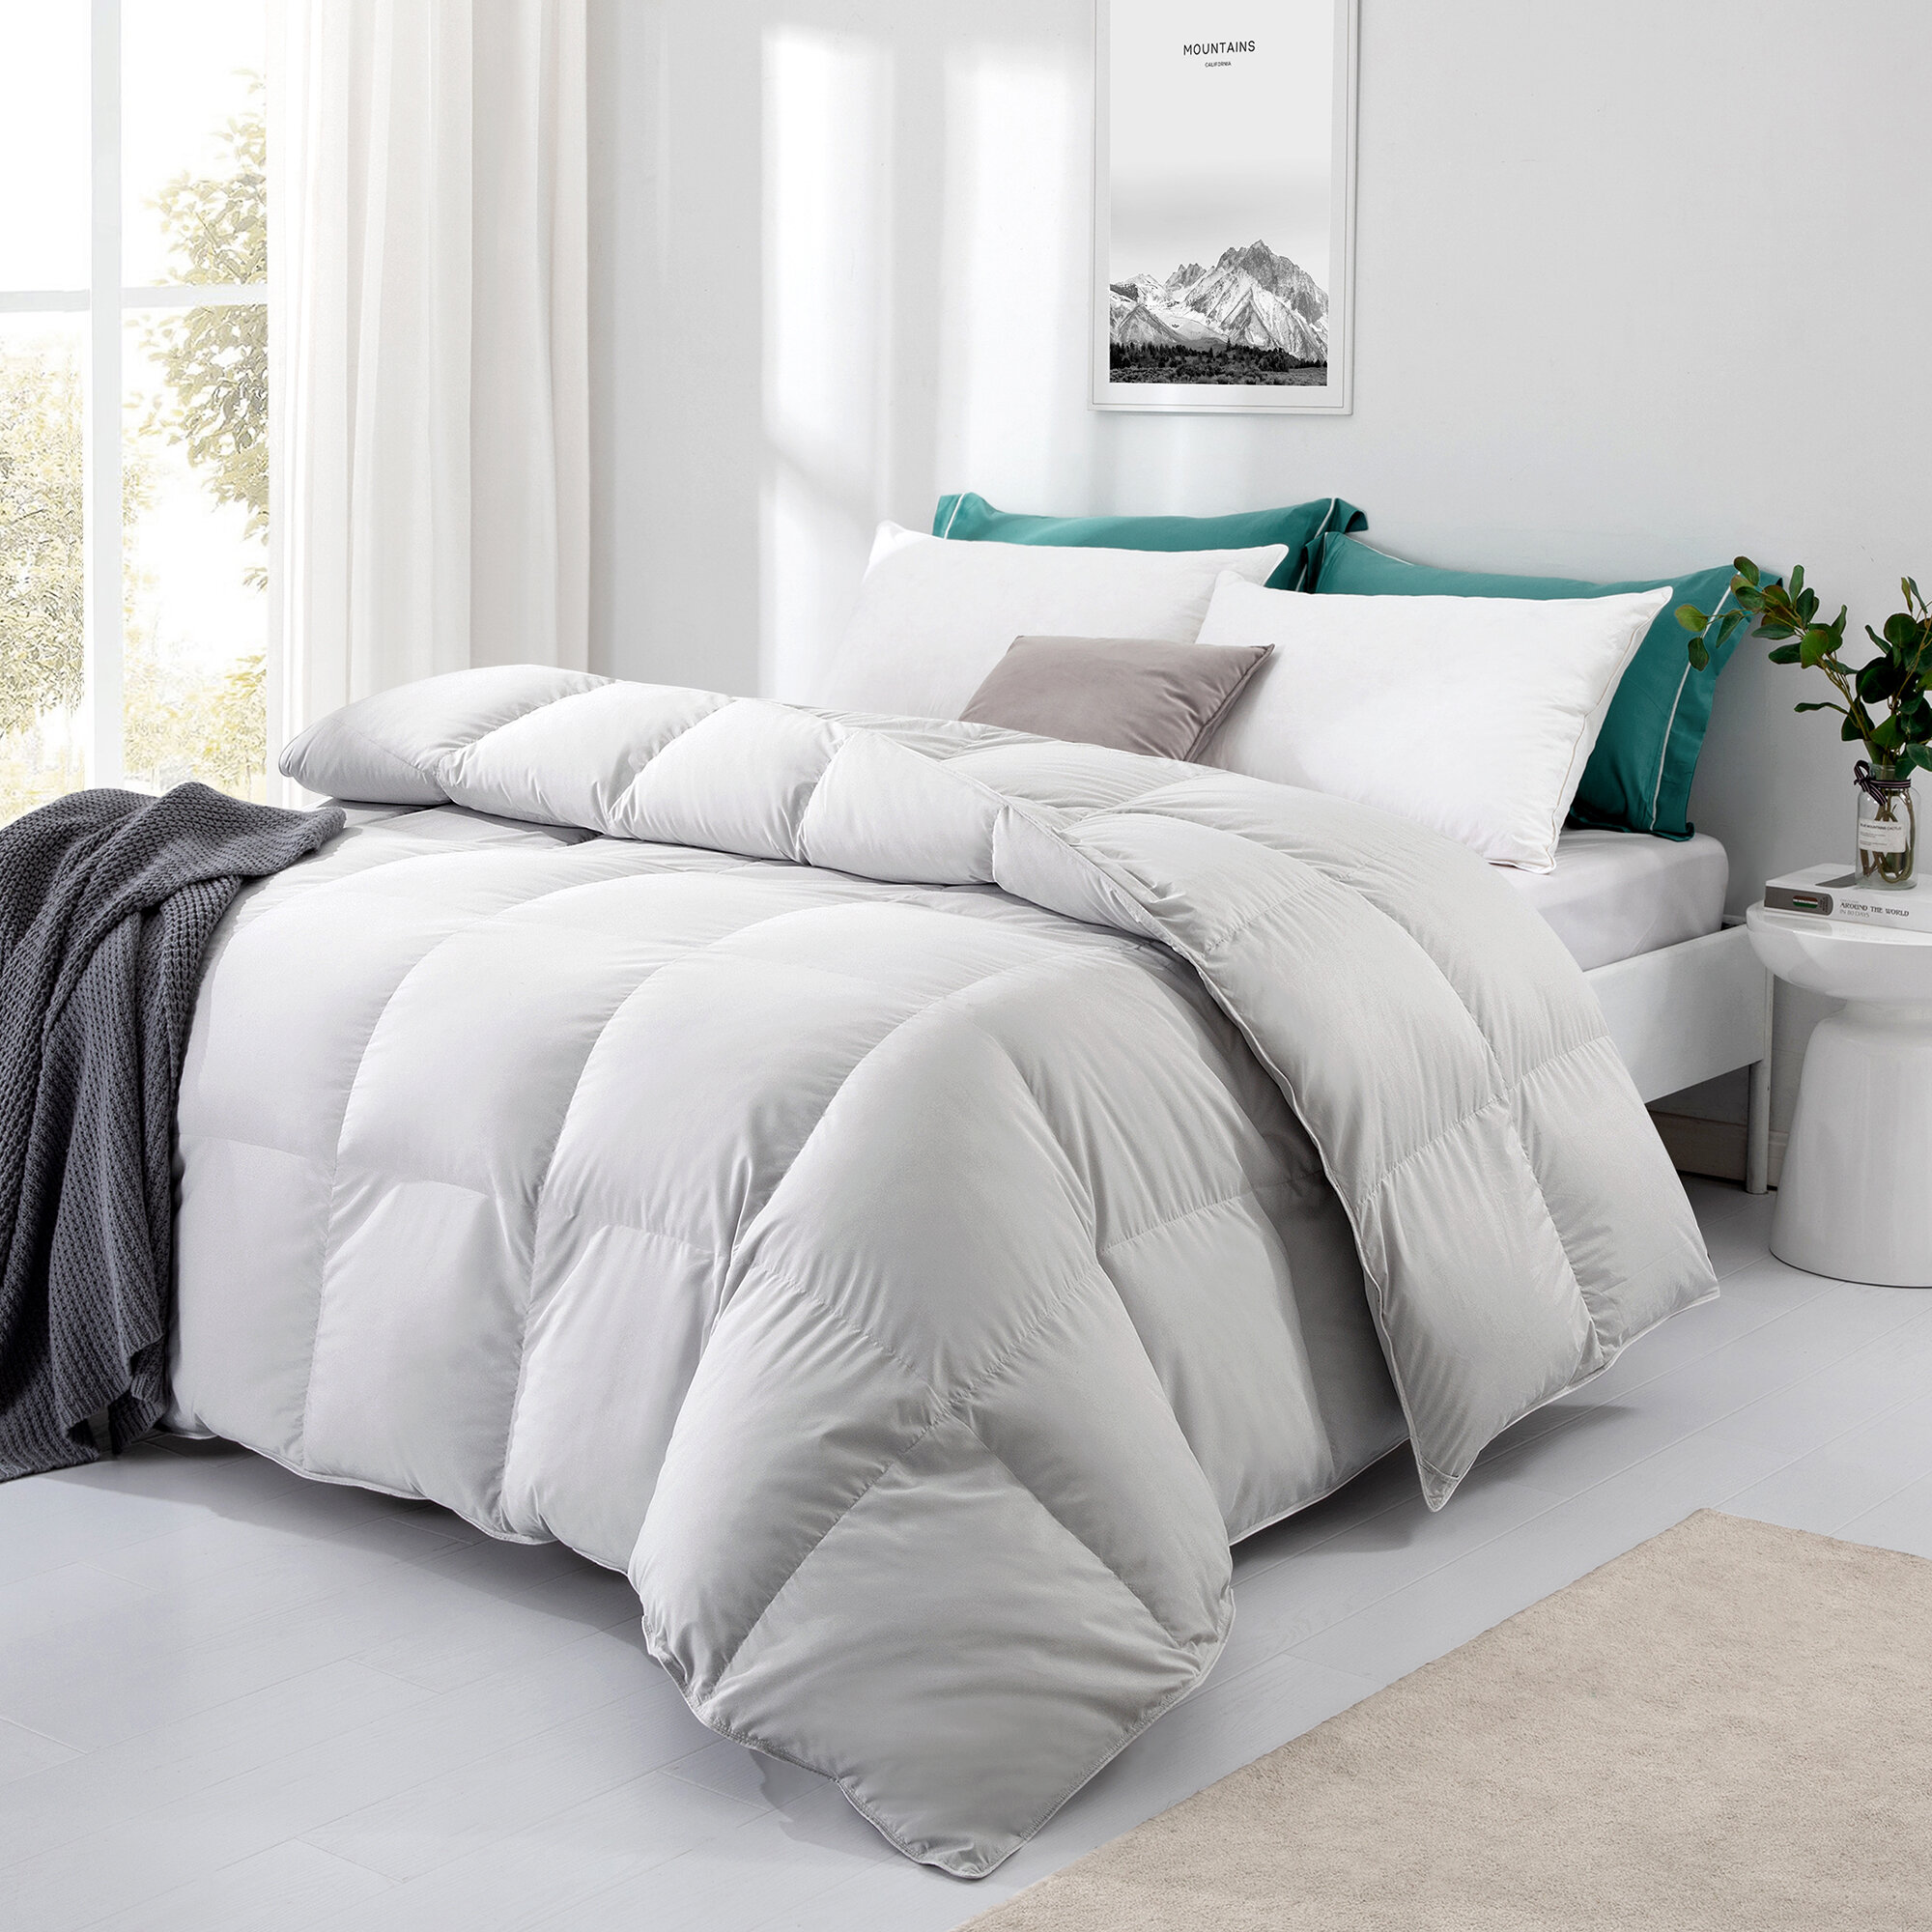 Alwyn Home 600 All Season Duck Down Comforter Reviews Wayfair